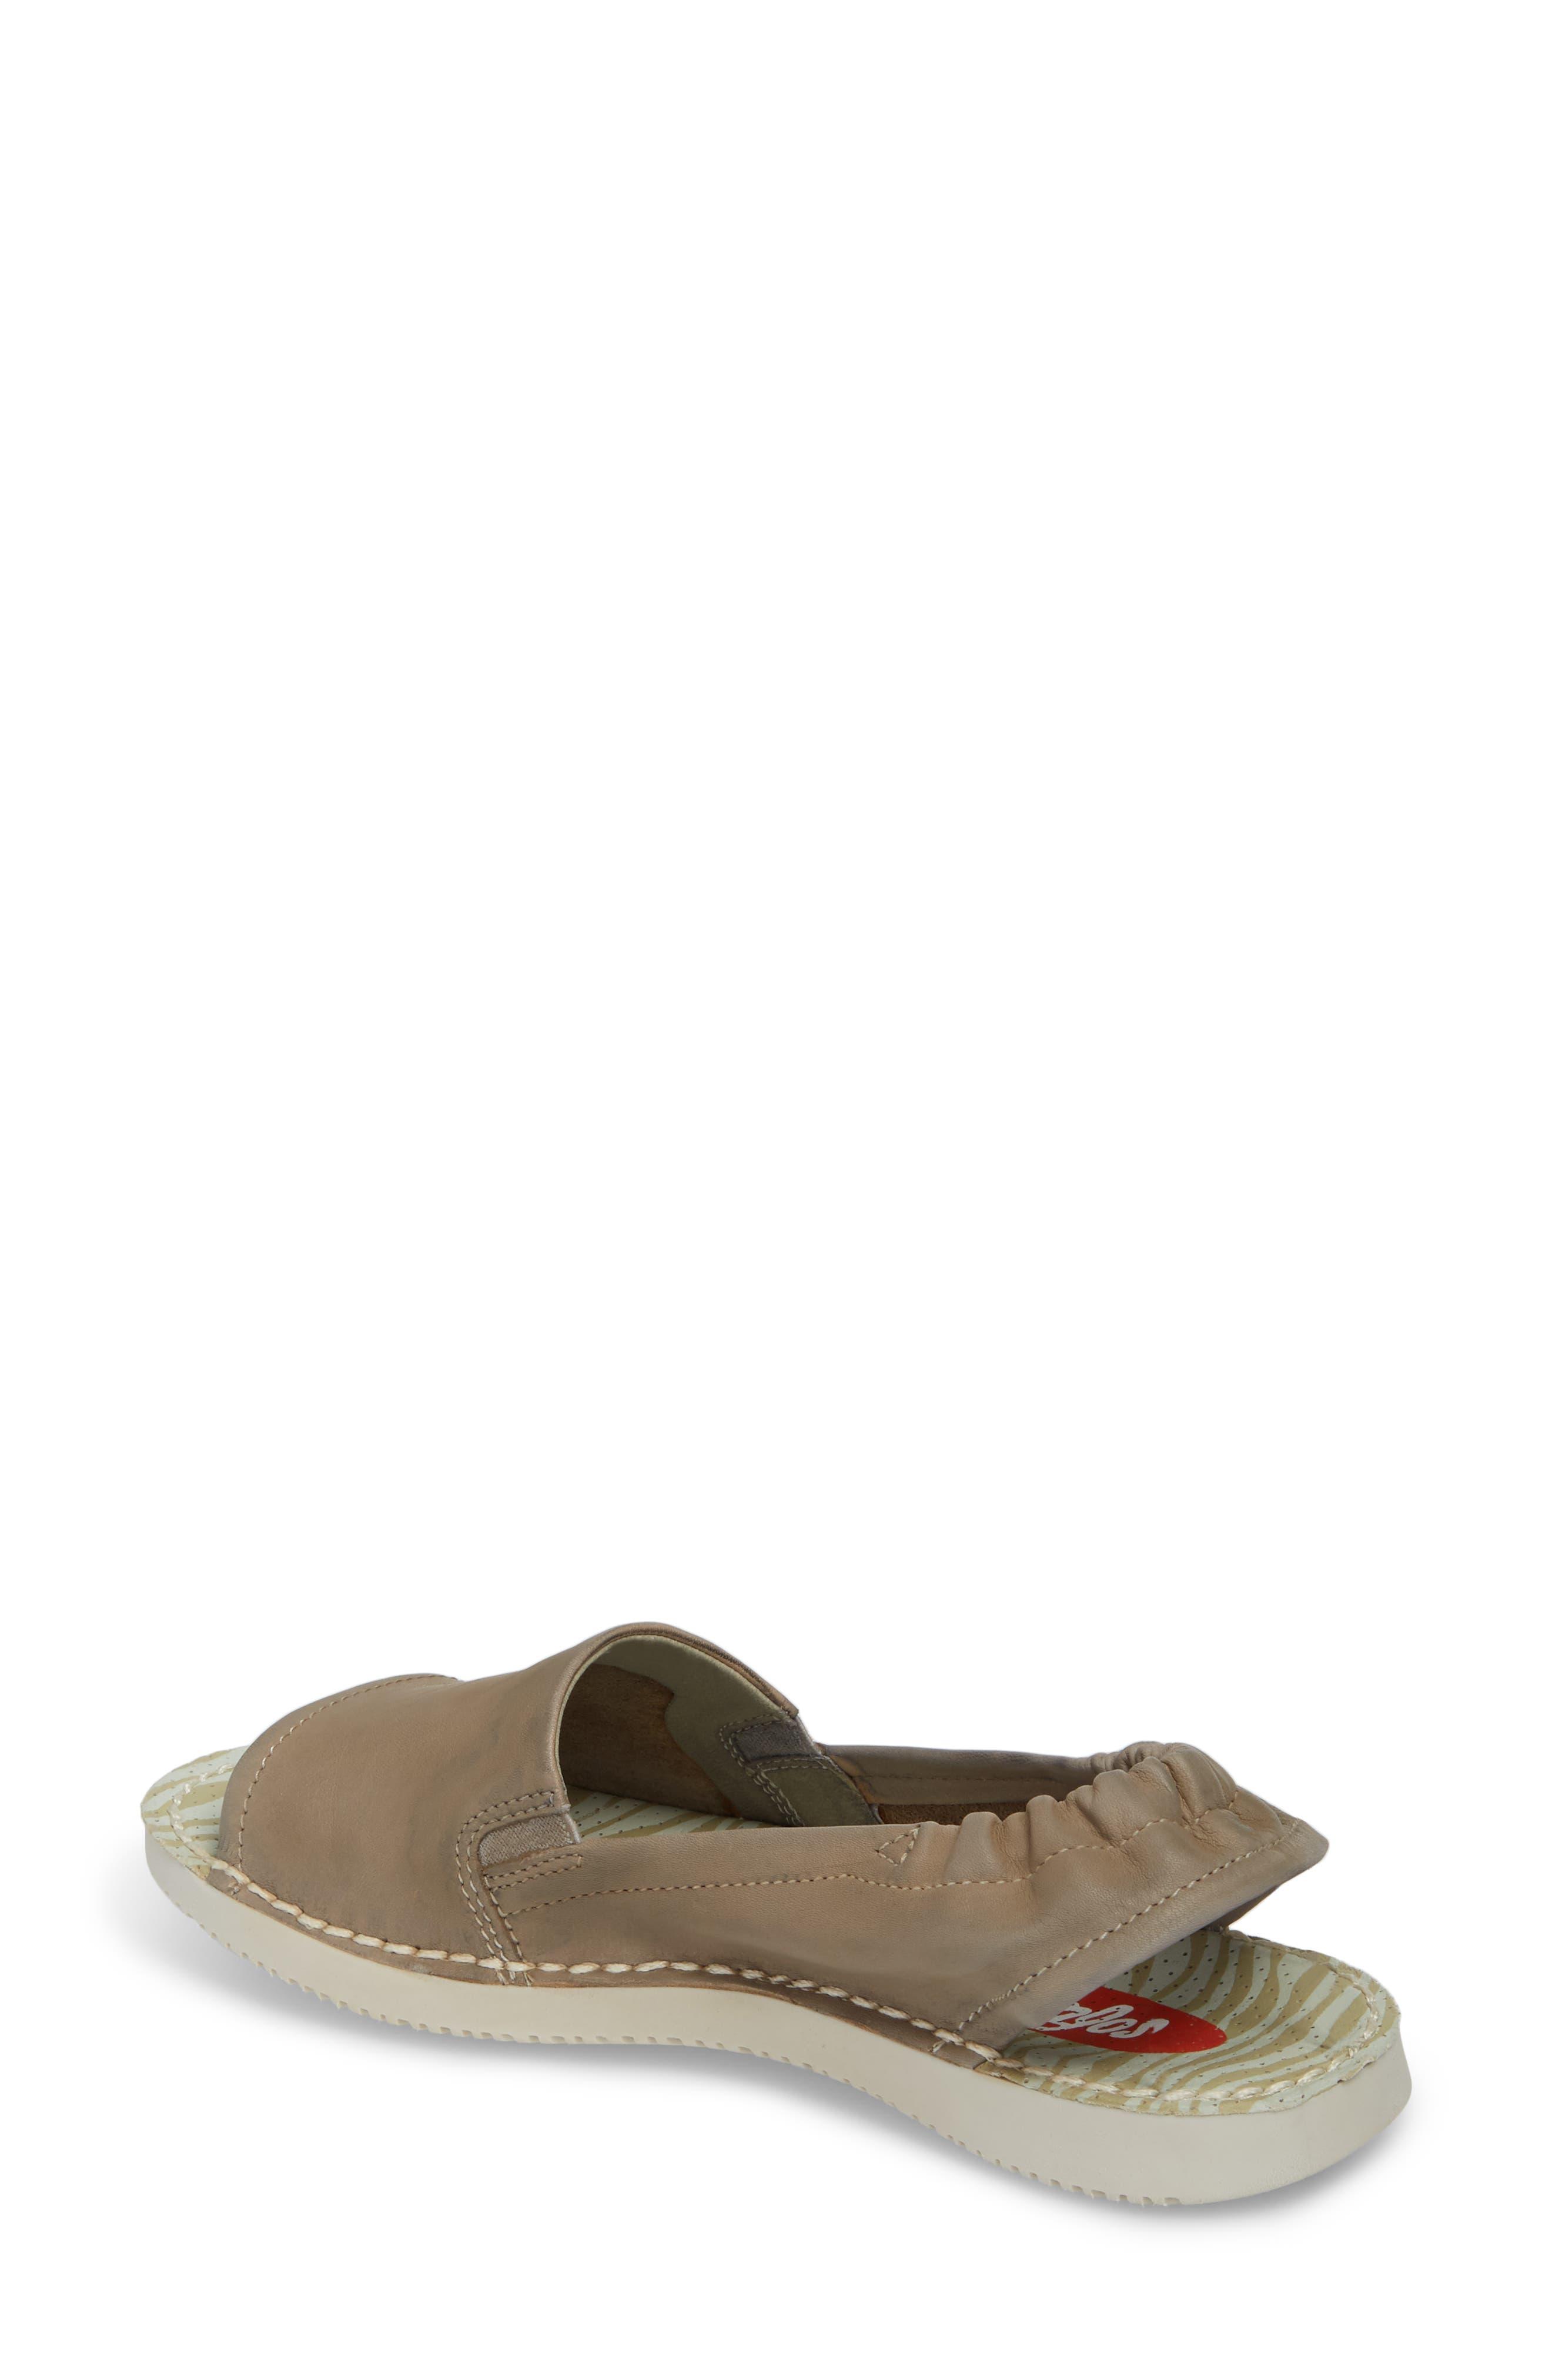 Tee Flat Sandal,                             Alternate thumbnail 2, color,                             Taupe Leather